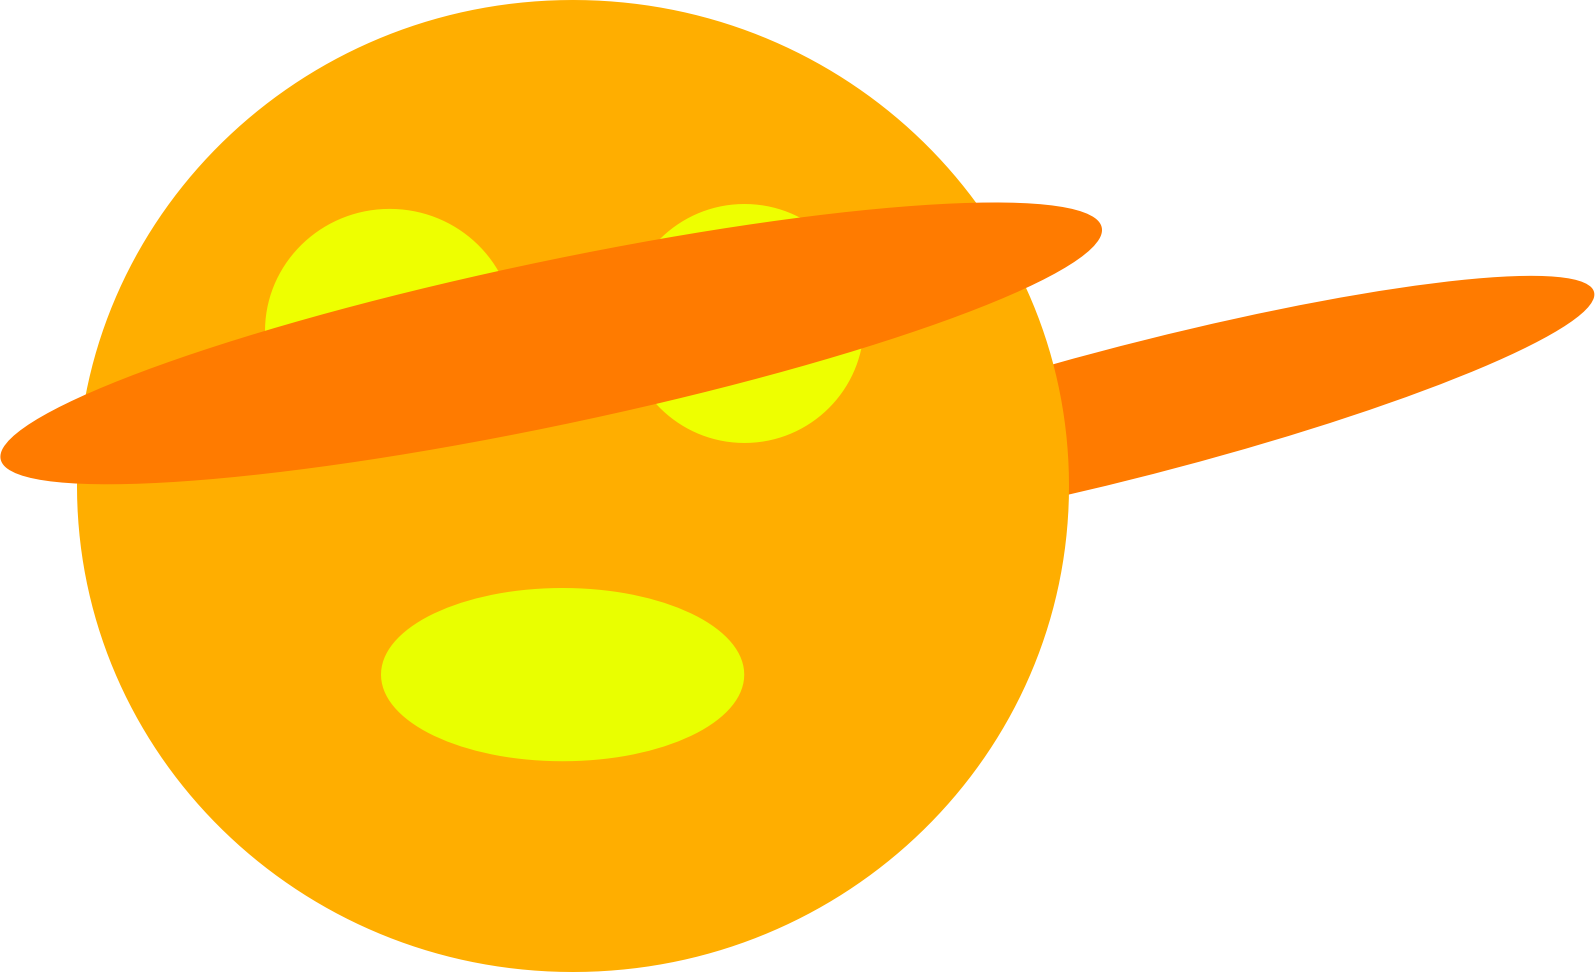 Dab. Emoji clipart fruit